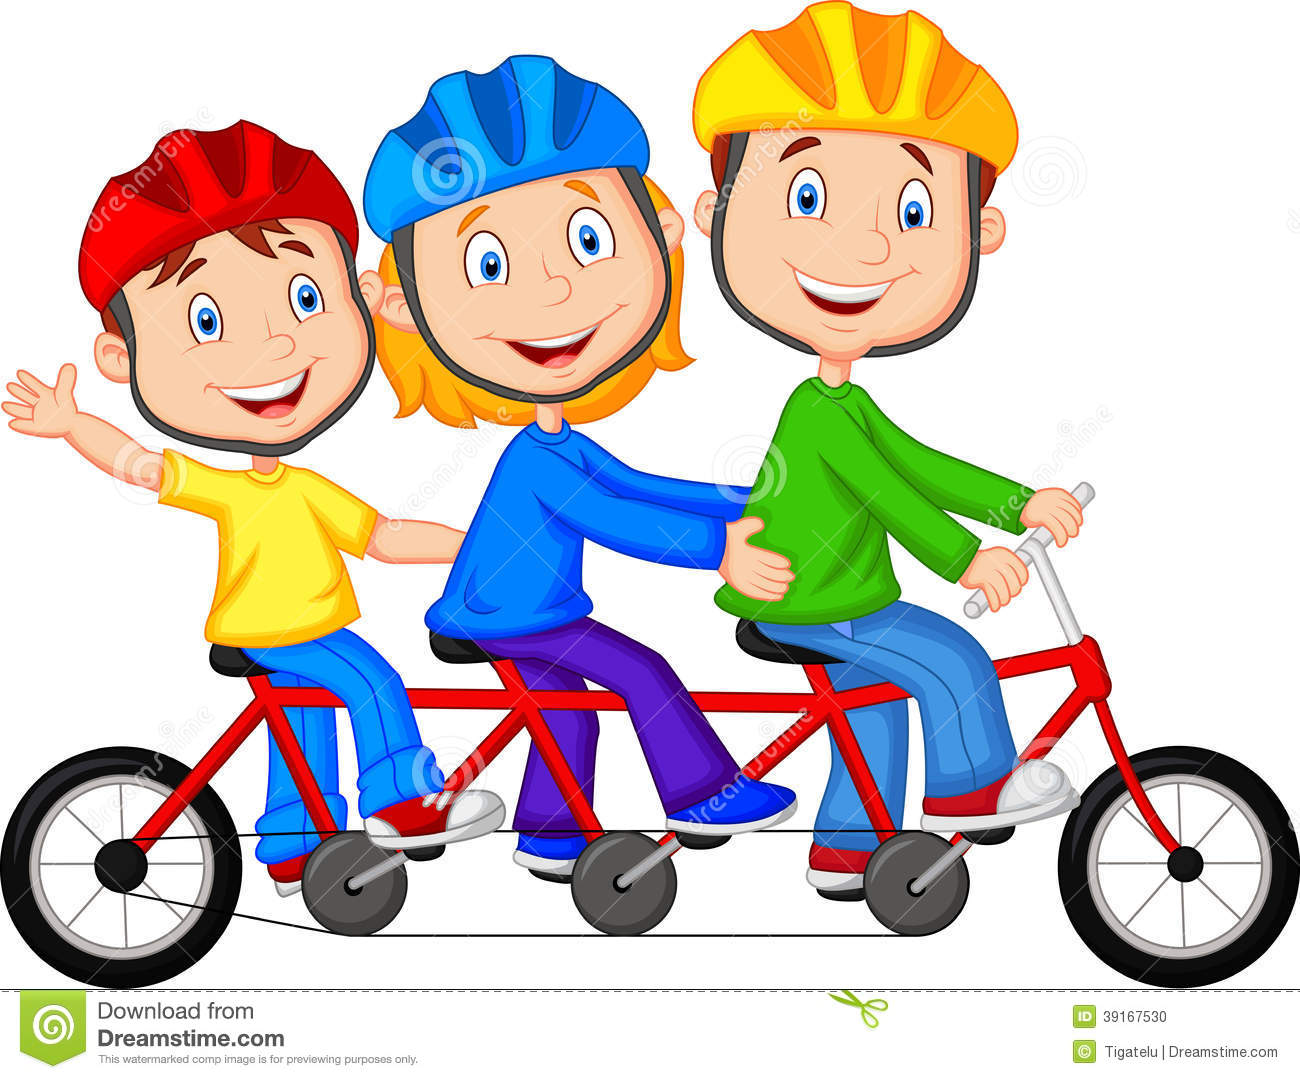 Family riding bikes clipart.